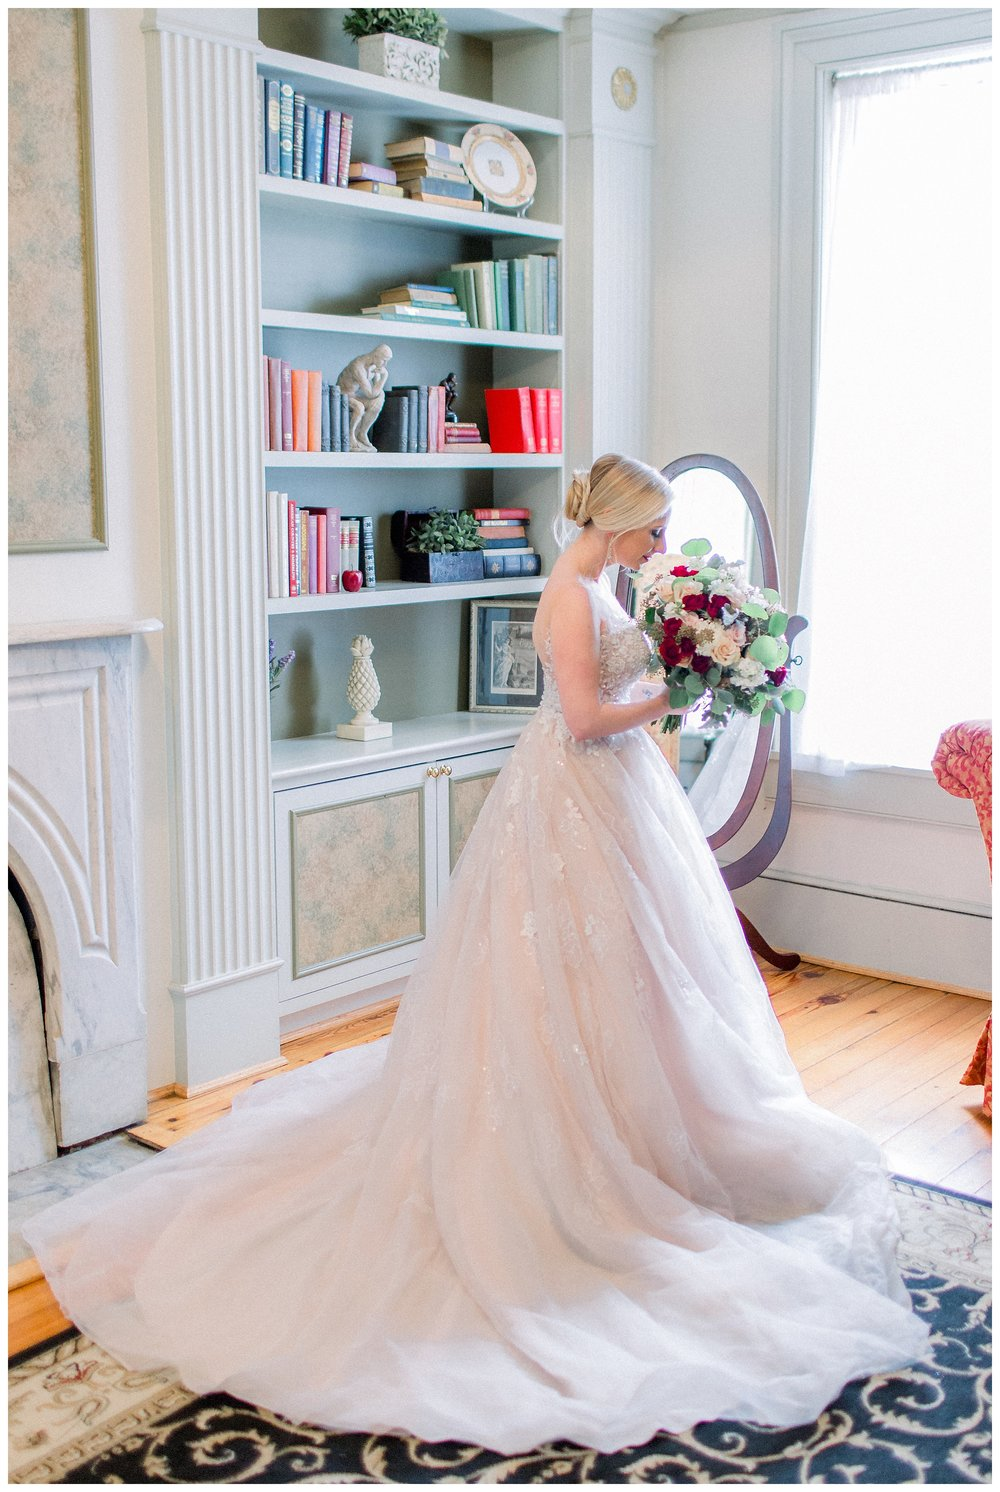 Whitehall Estate Wedding | Northern Virginia Wedding Photographer Kir Tuben_0027.jpg